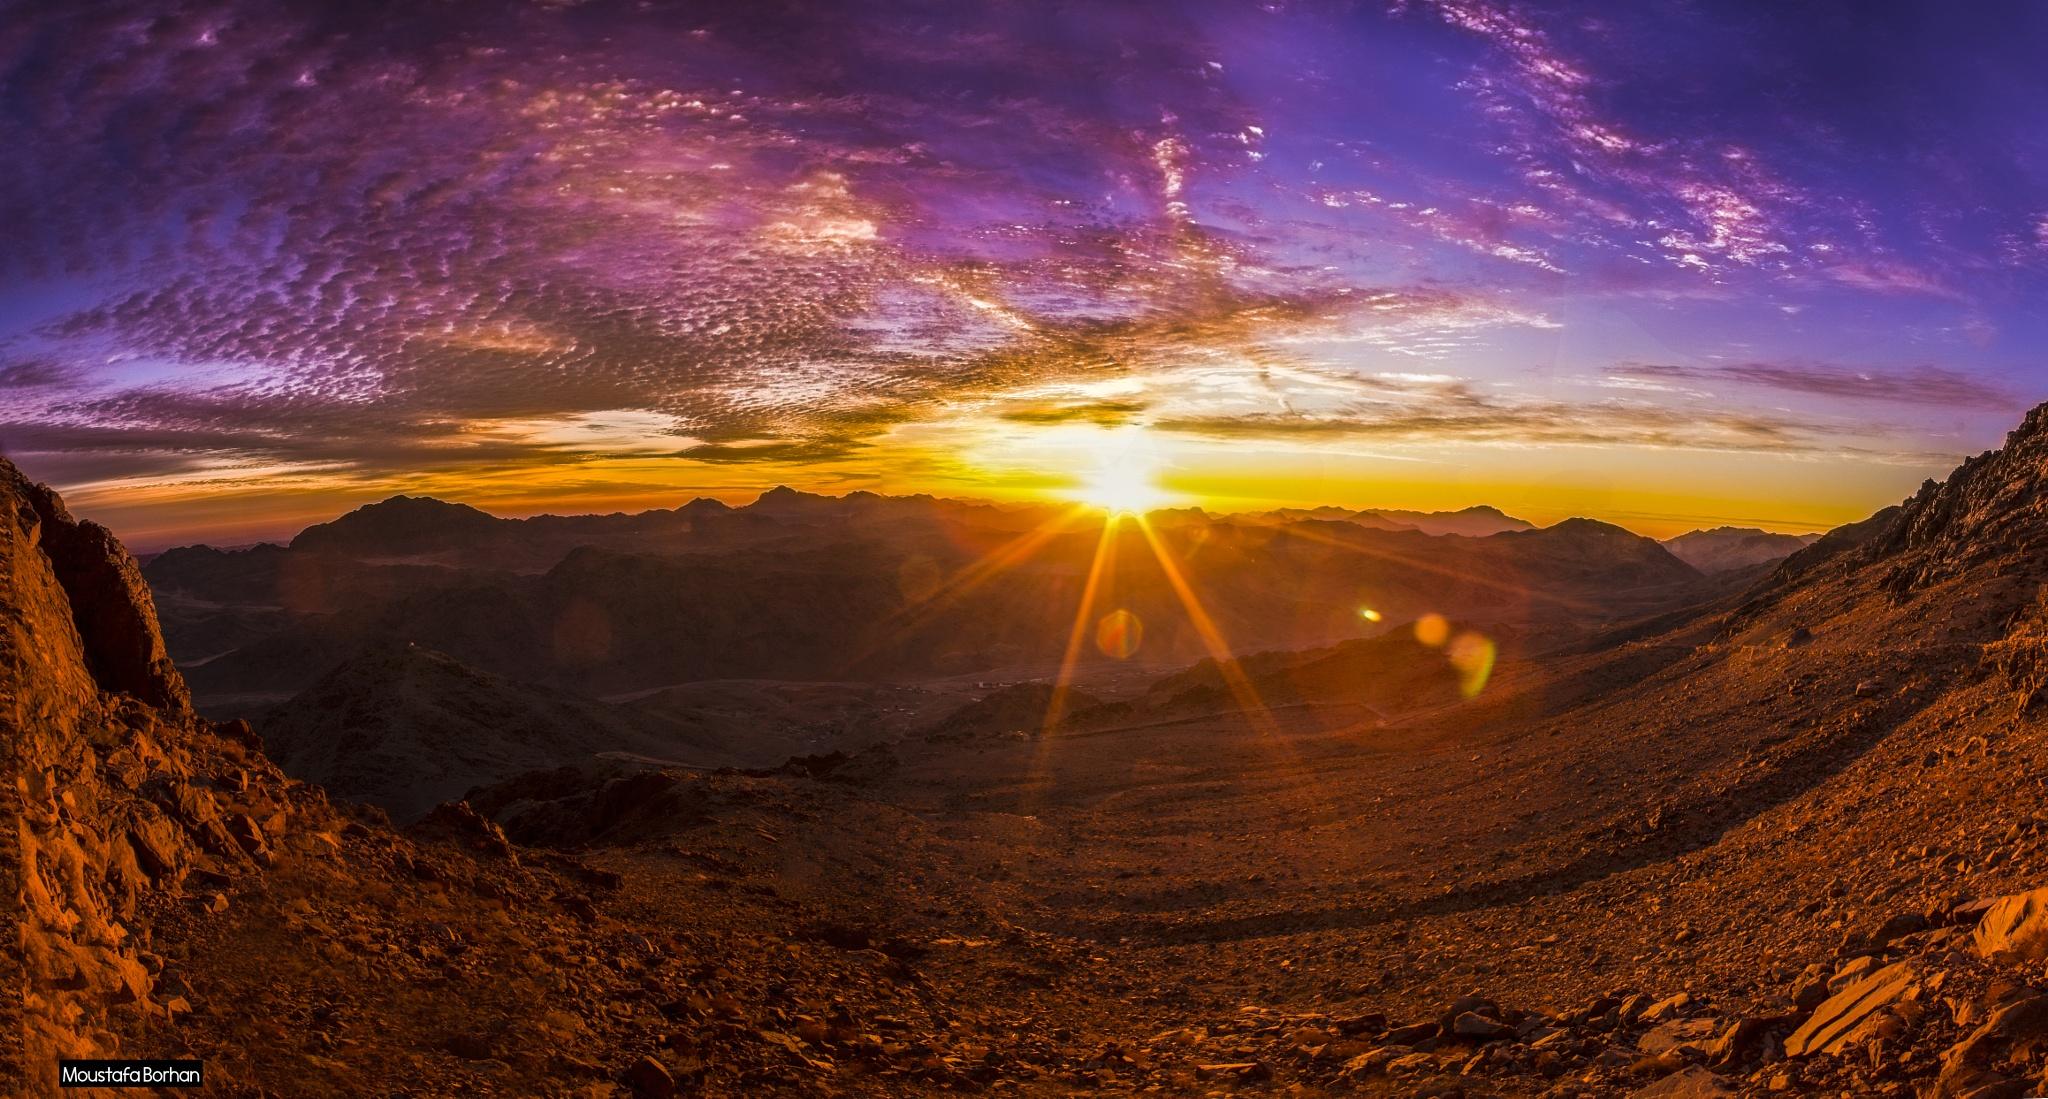 a beautiful sunrise by Moustafa Borhan